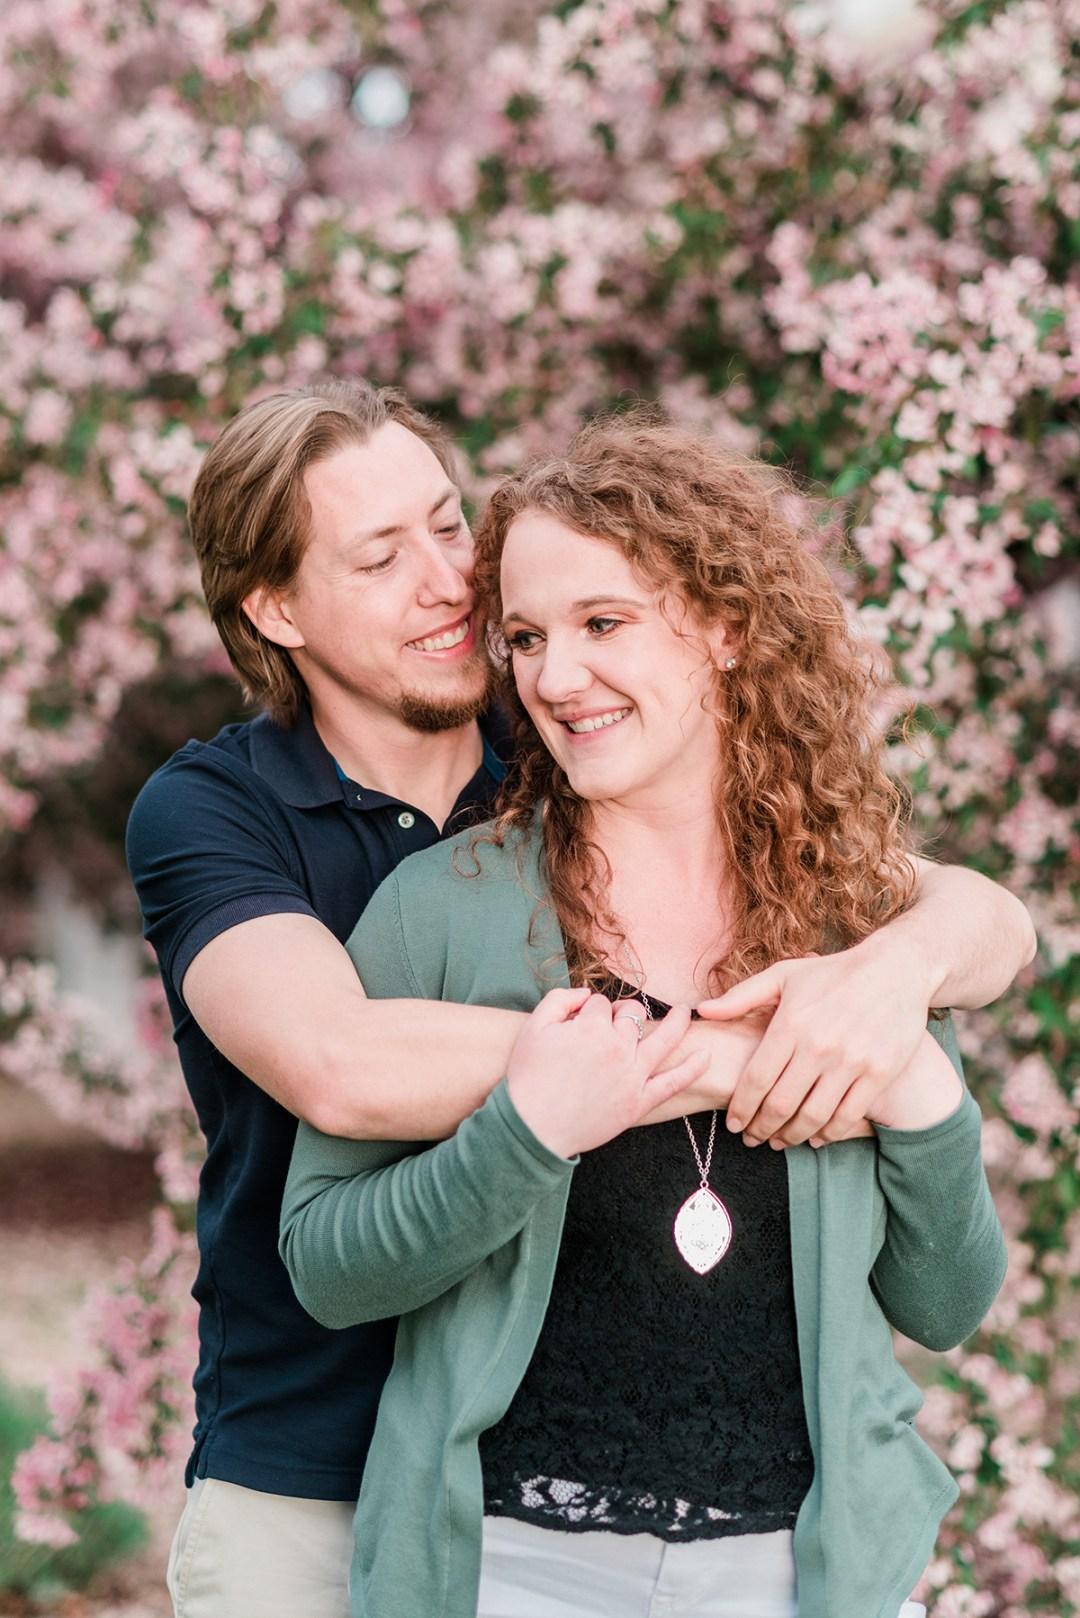 Sam & Cloie's spring blossoms engagement photos in Palisade | captured by Amanda Matilda Photography - Palisade engagement photographer